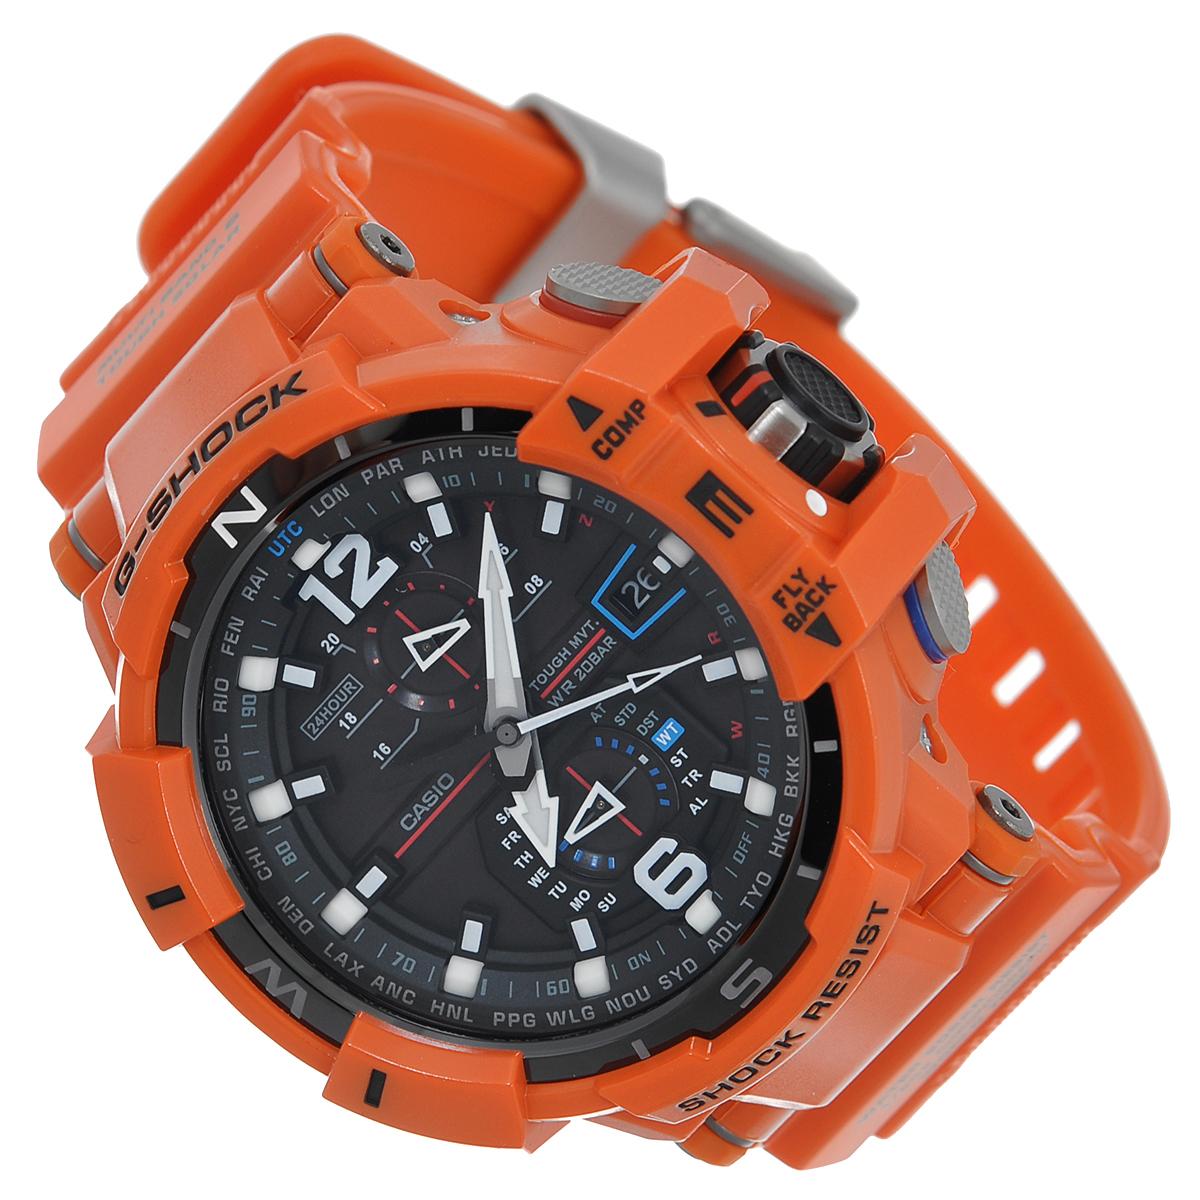 "Часы мужские наручные Casio ""G-Shock"", цвет: оранжевый. GW-A1100R-4A ( GW-A1100R-4A )"